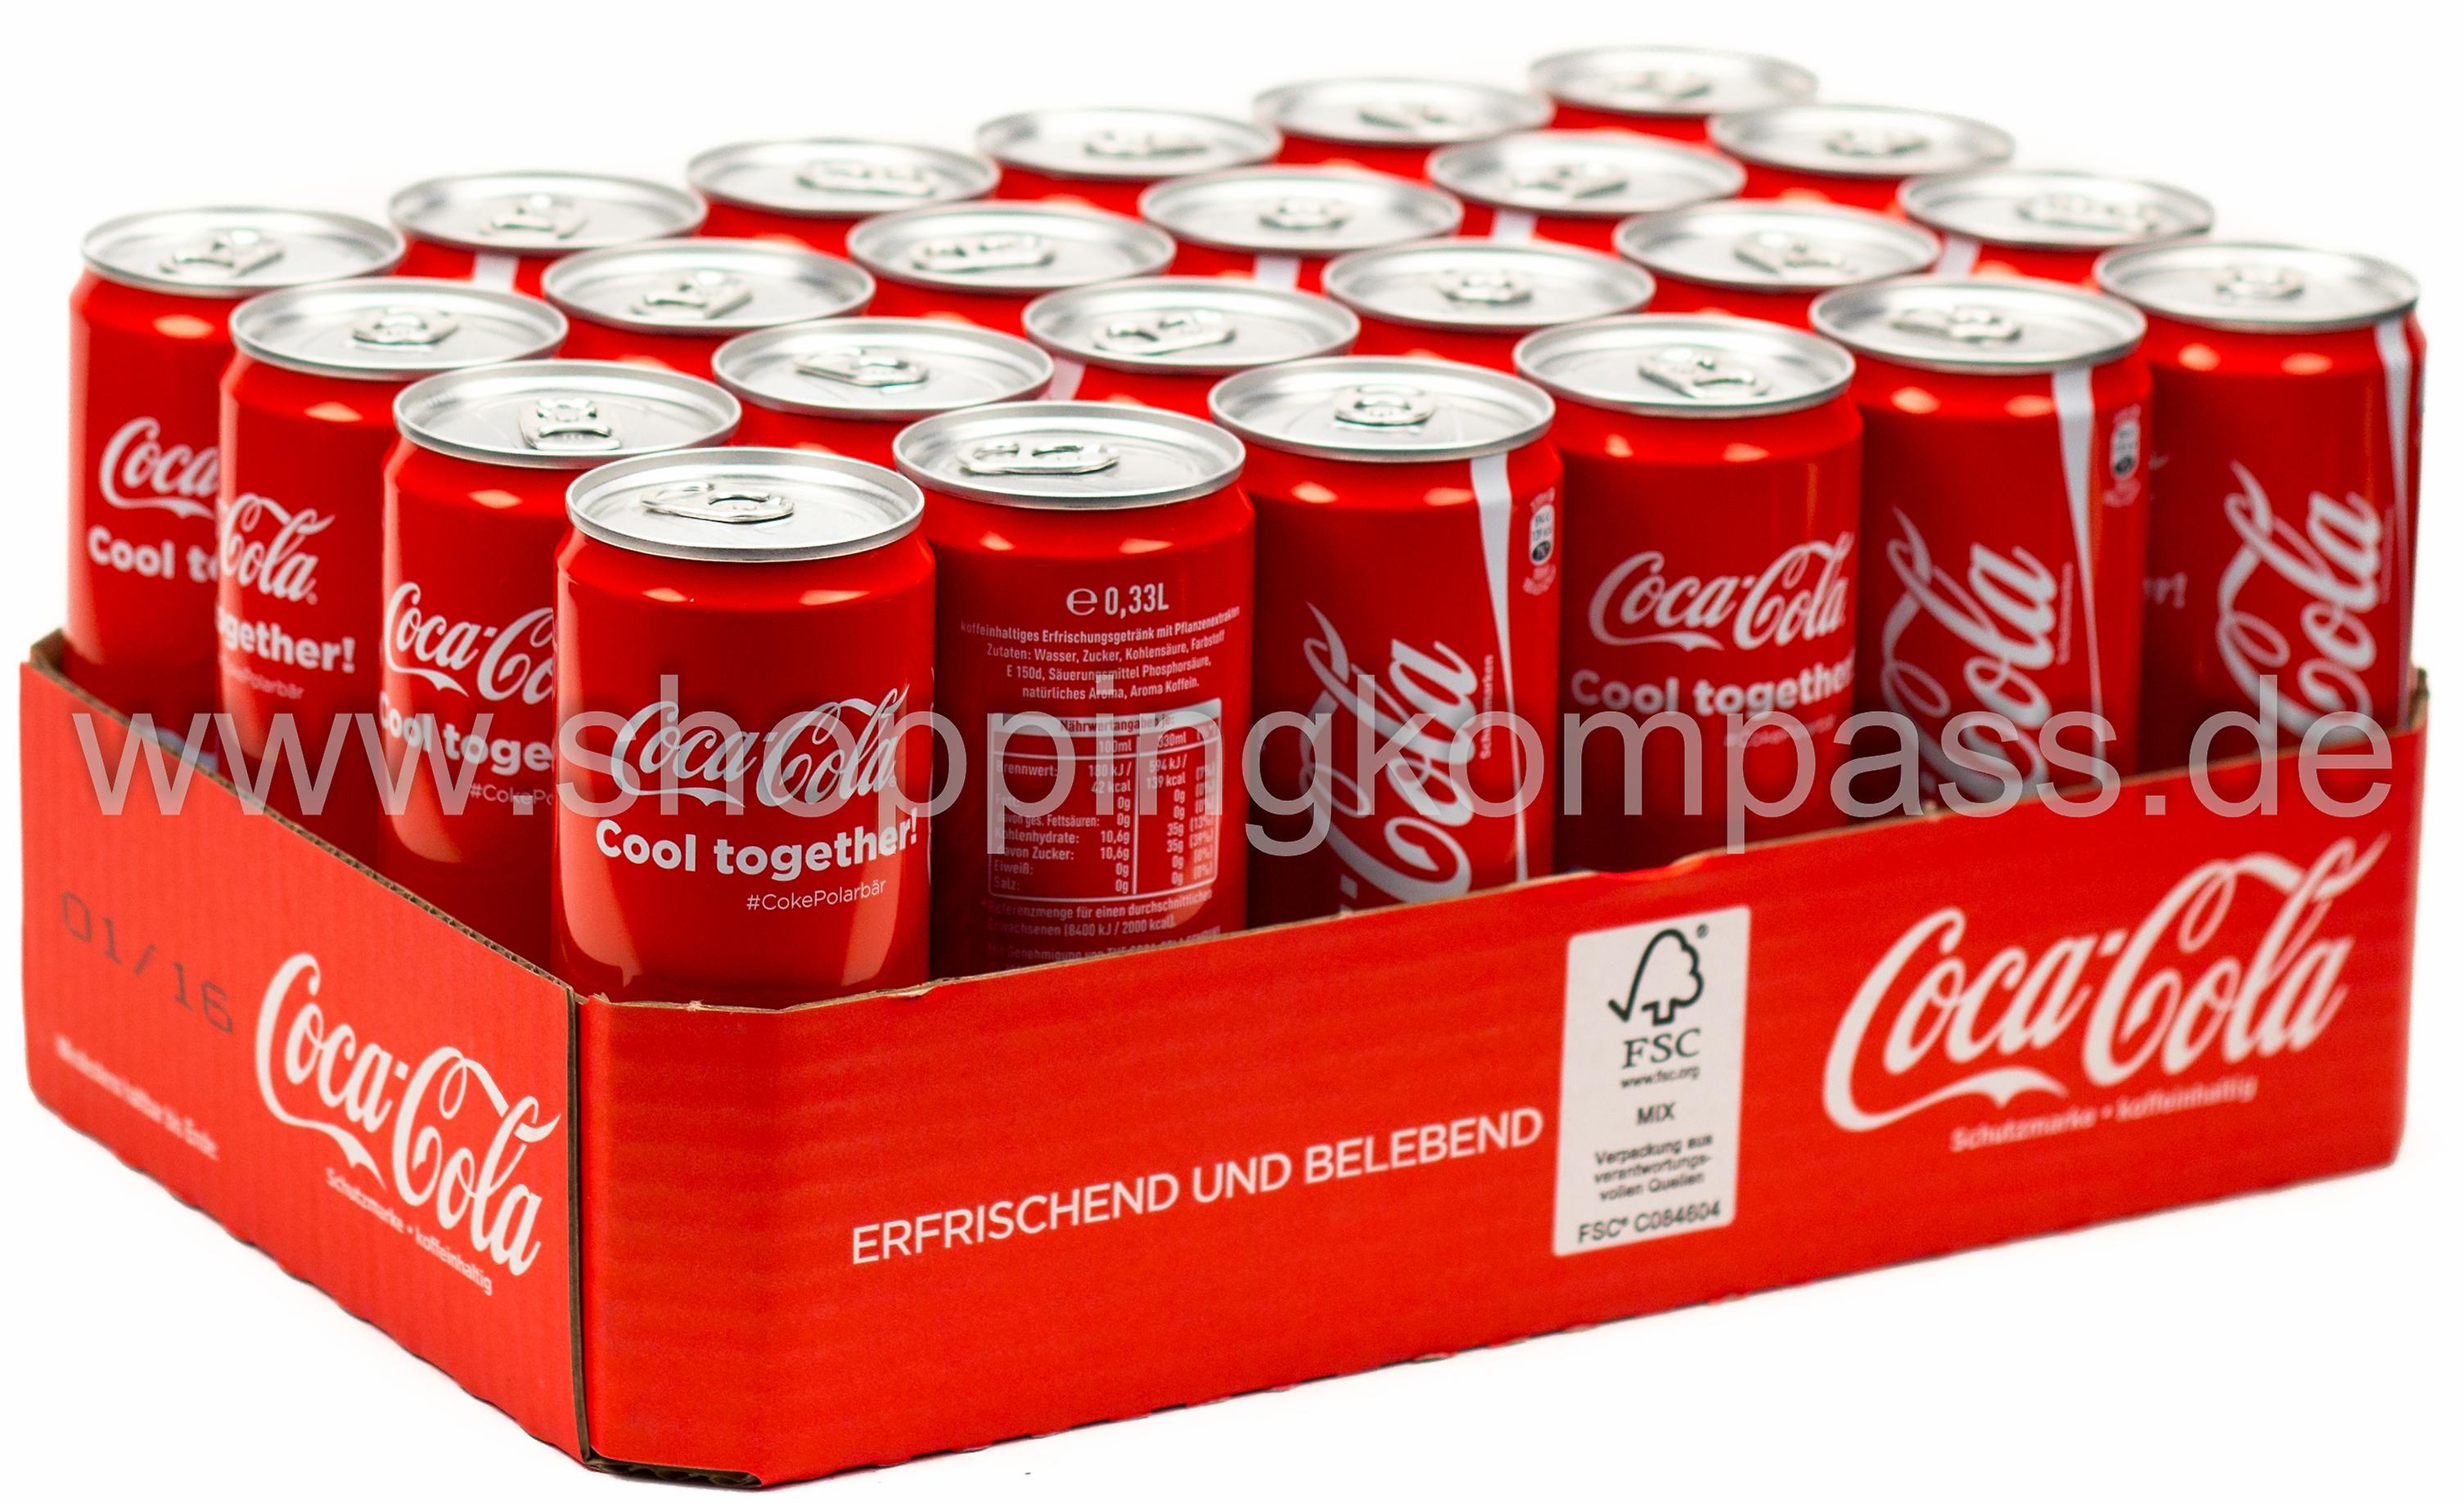 cola colamixgetr nke coca cola karton 24 x 0 33 l dose ew ihr zuverl ssiger lieferservice. Black Bedroom Furniture Sets. Home Design Ideas